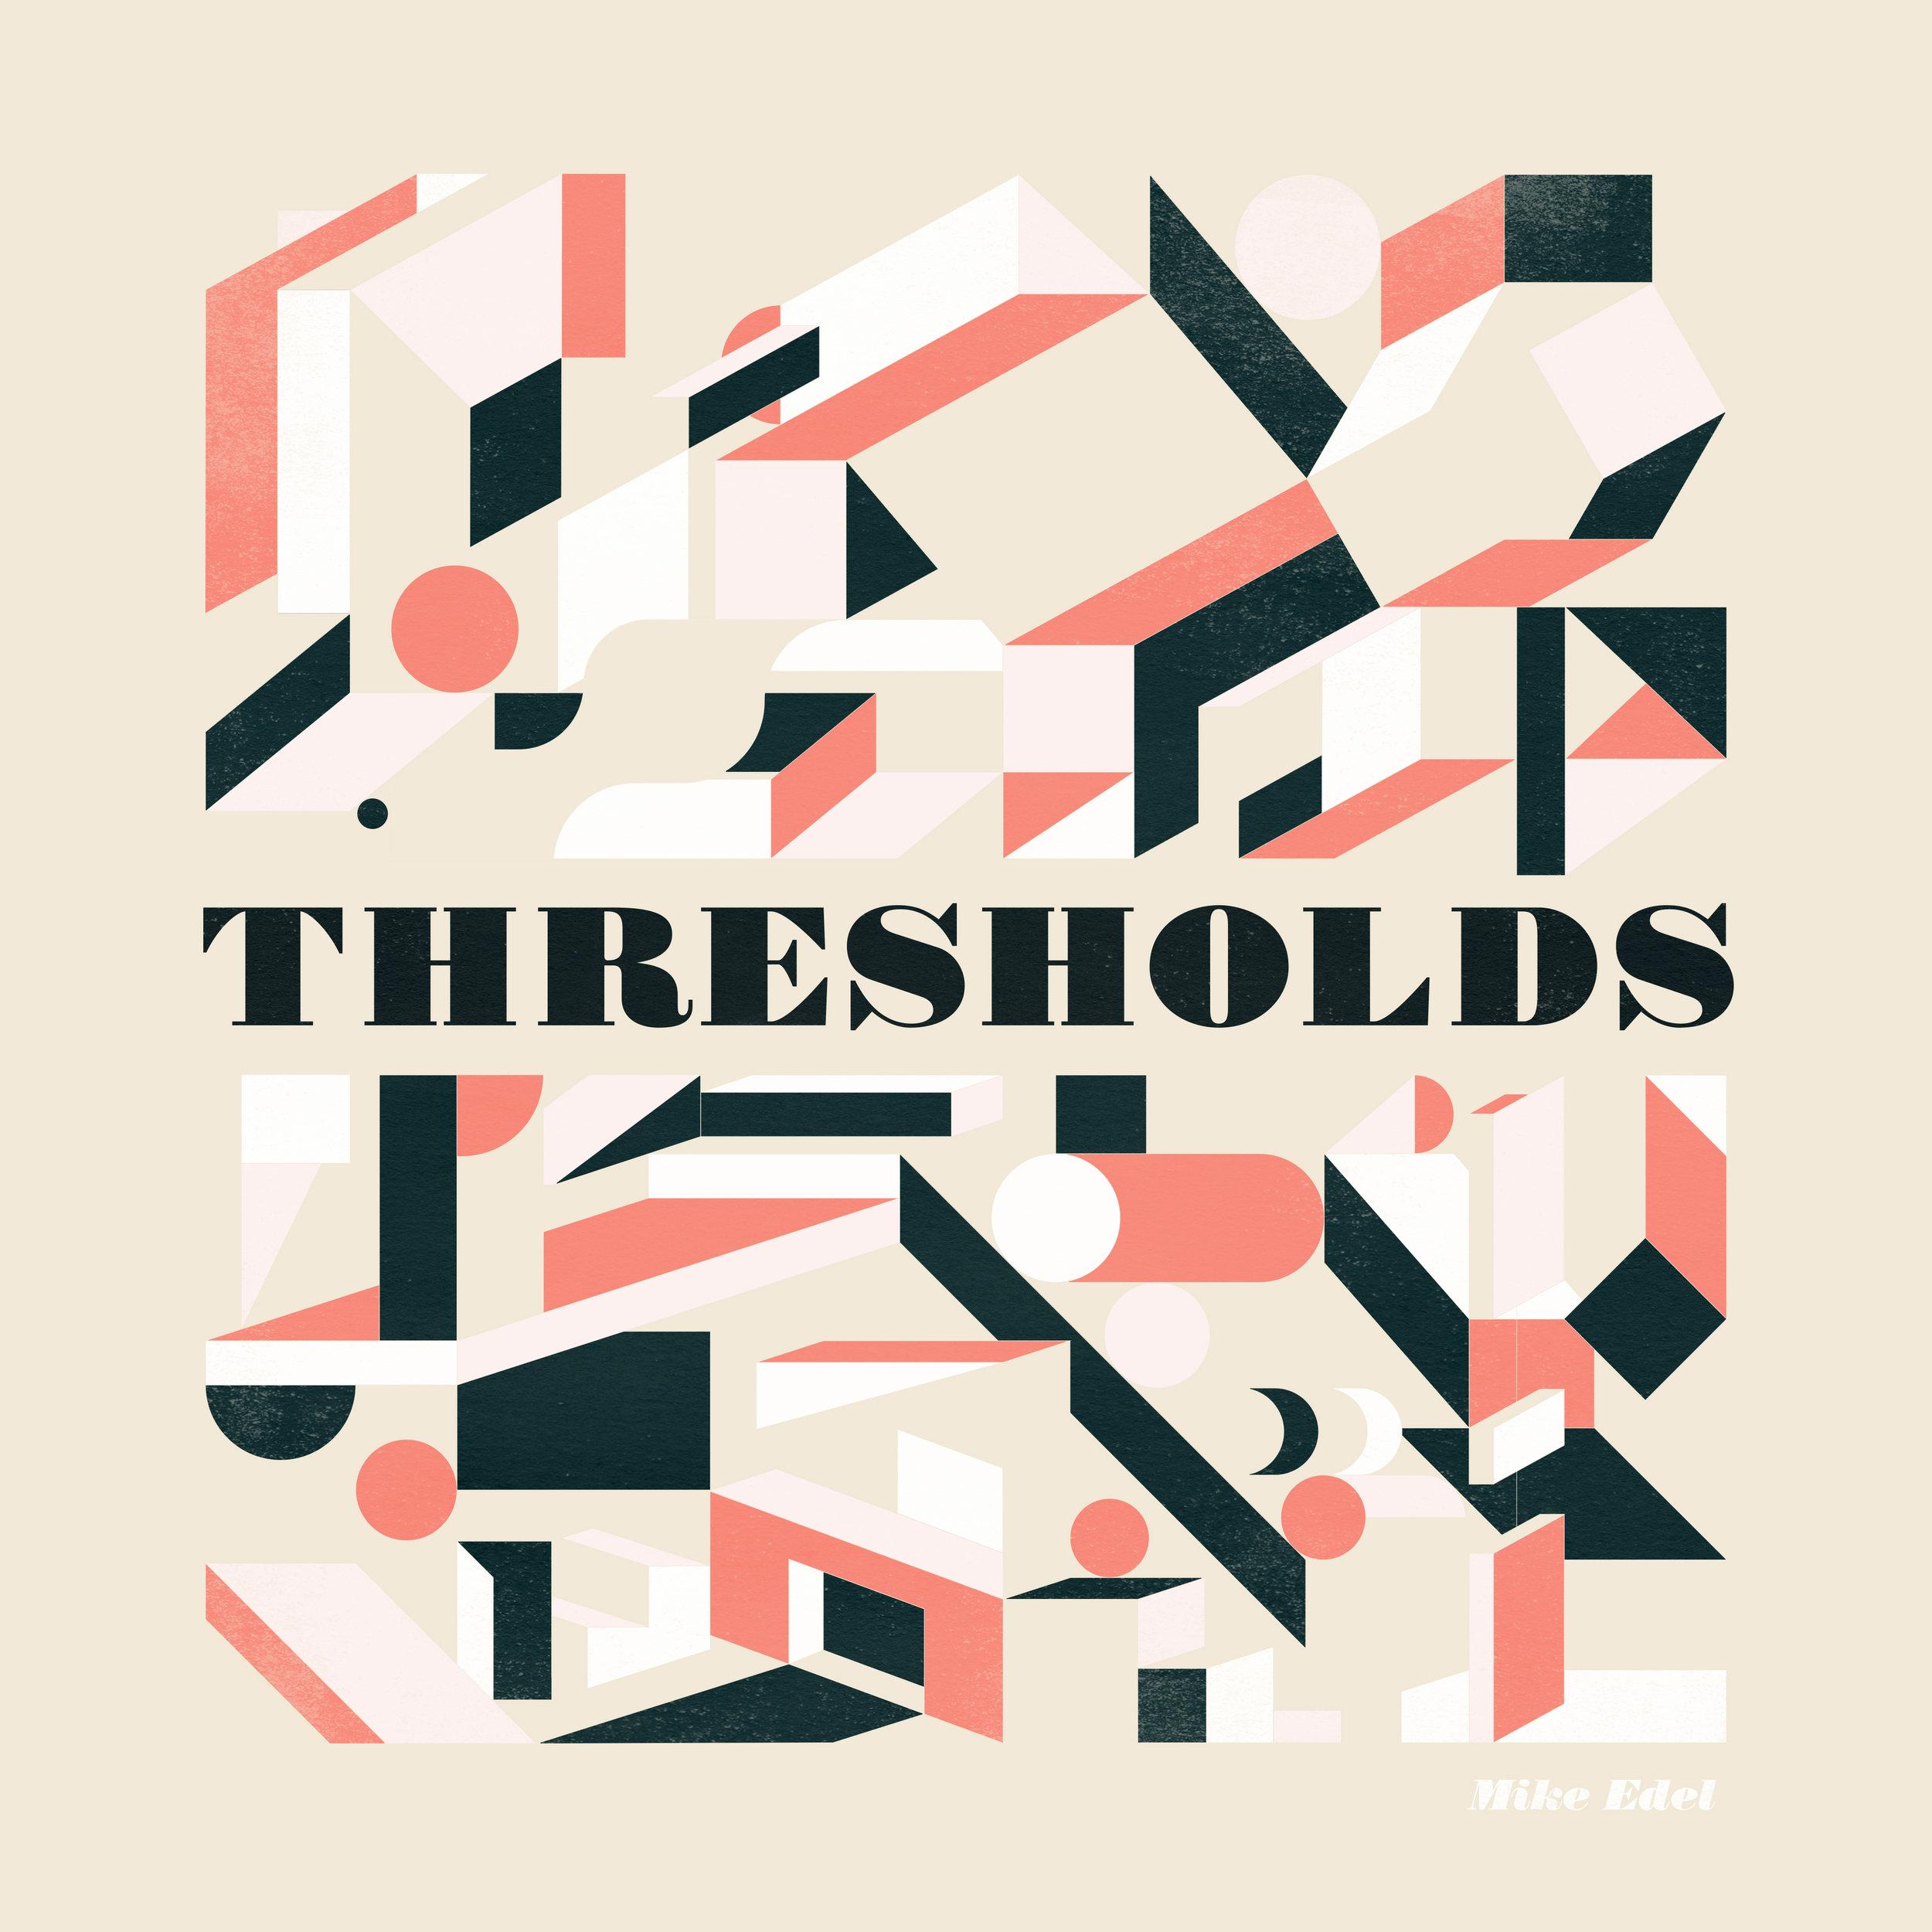 THRESHOLDS (MP3 Download) | Mike Edel | New Album THRESHOLDS